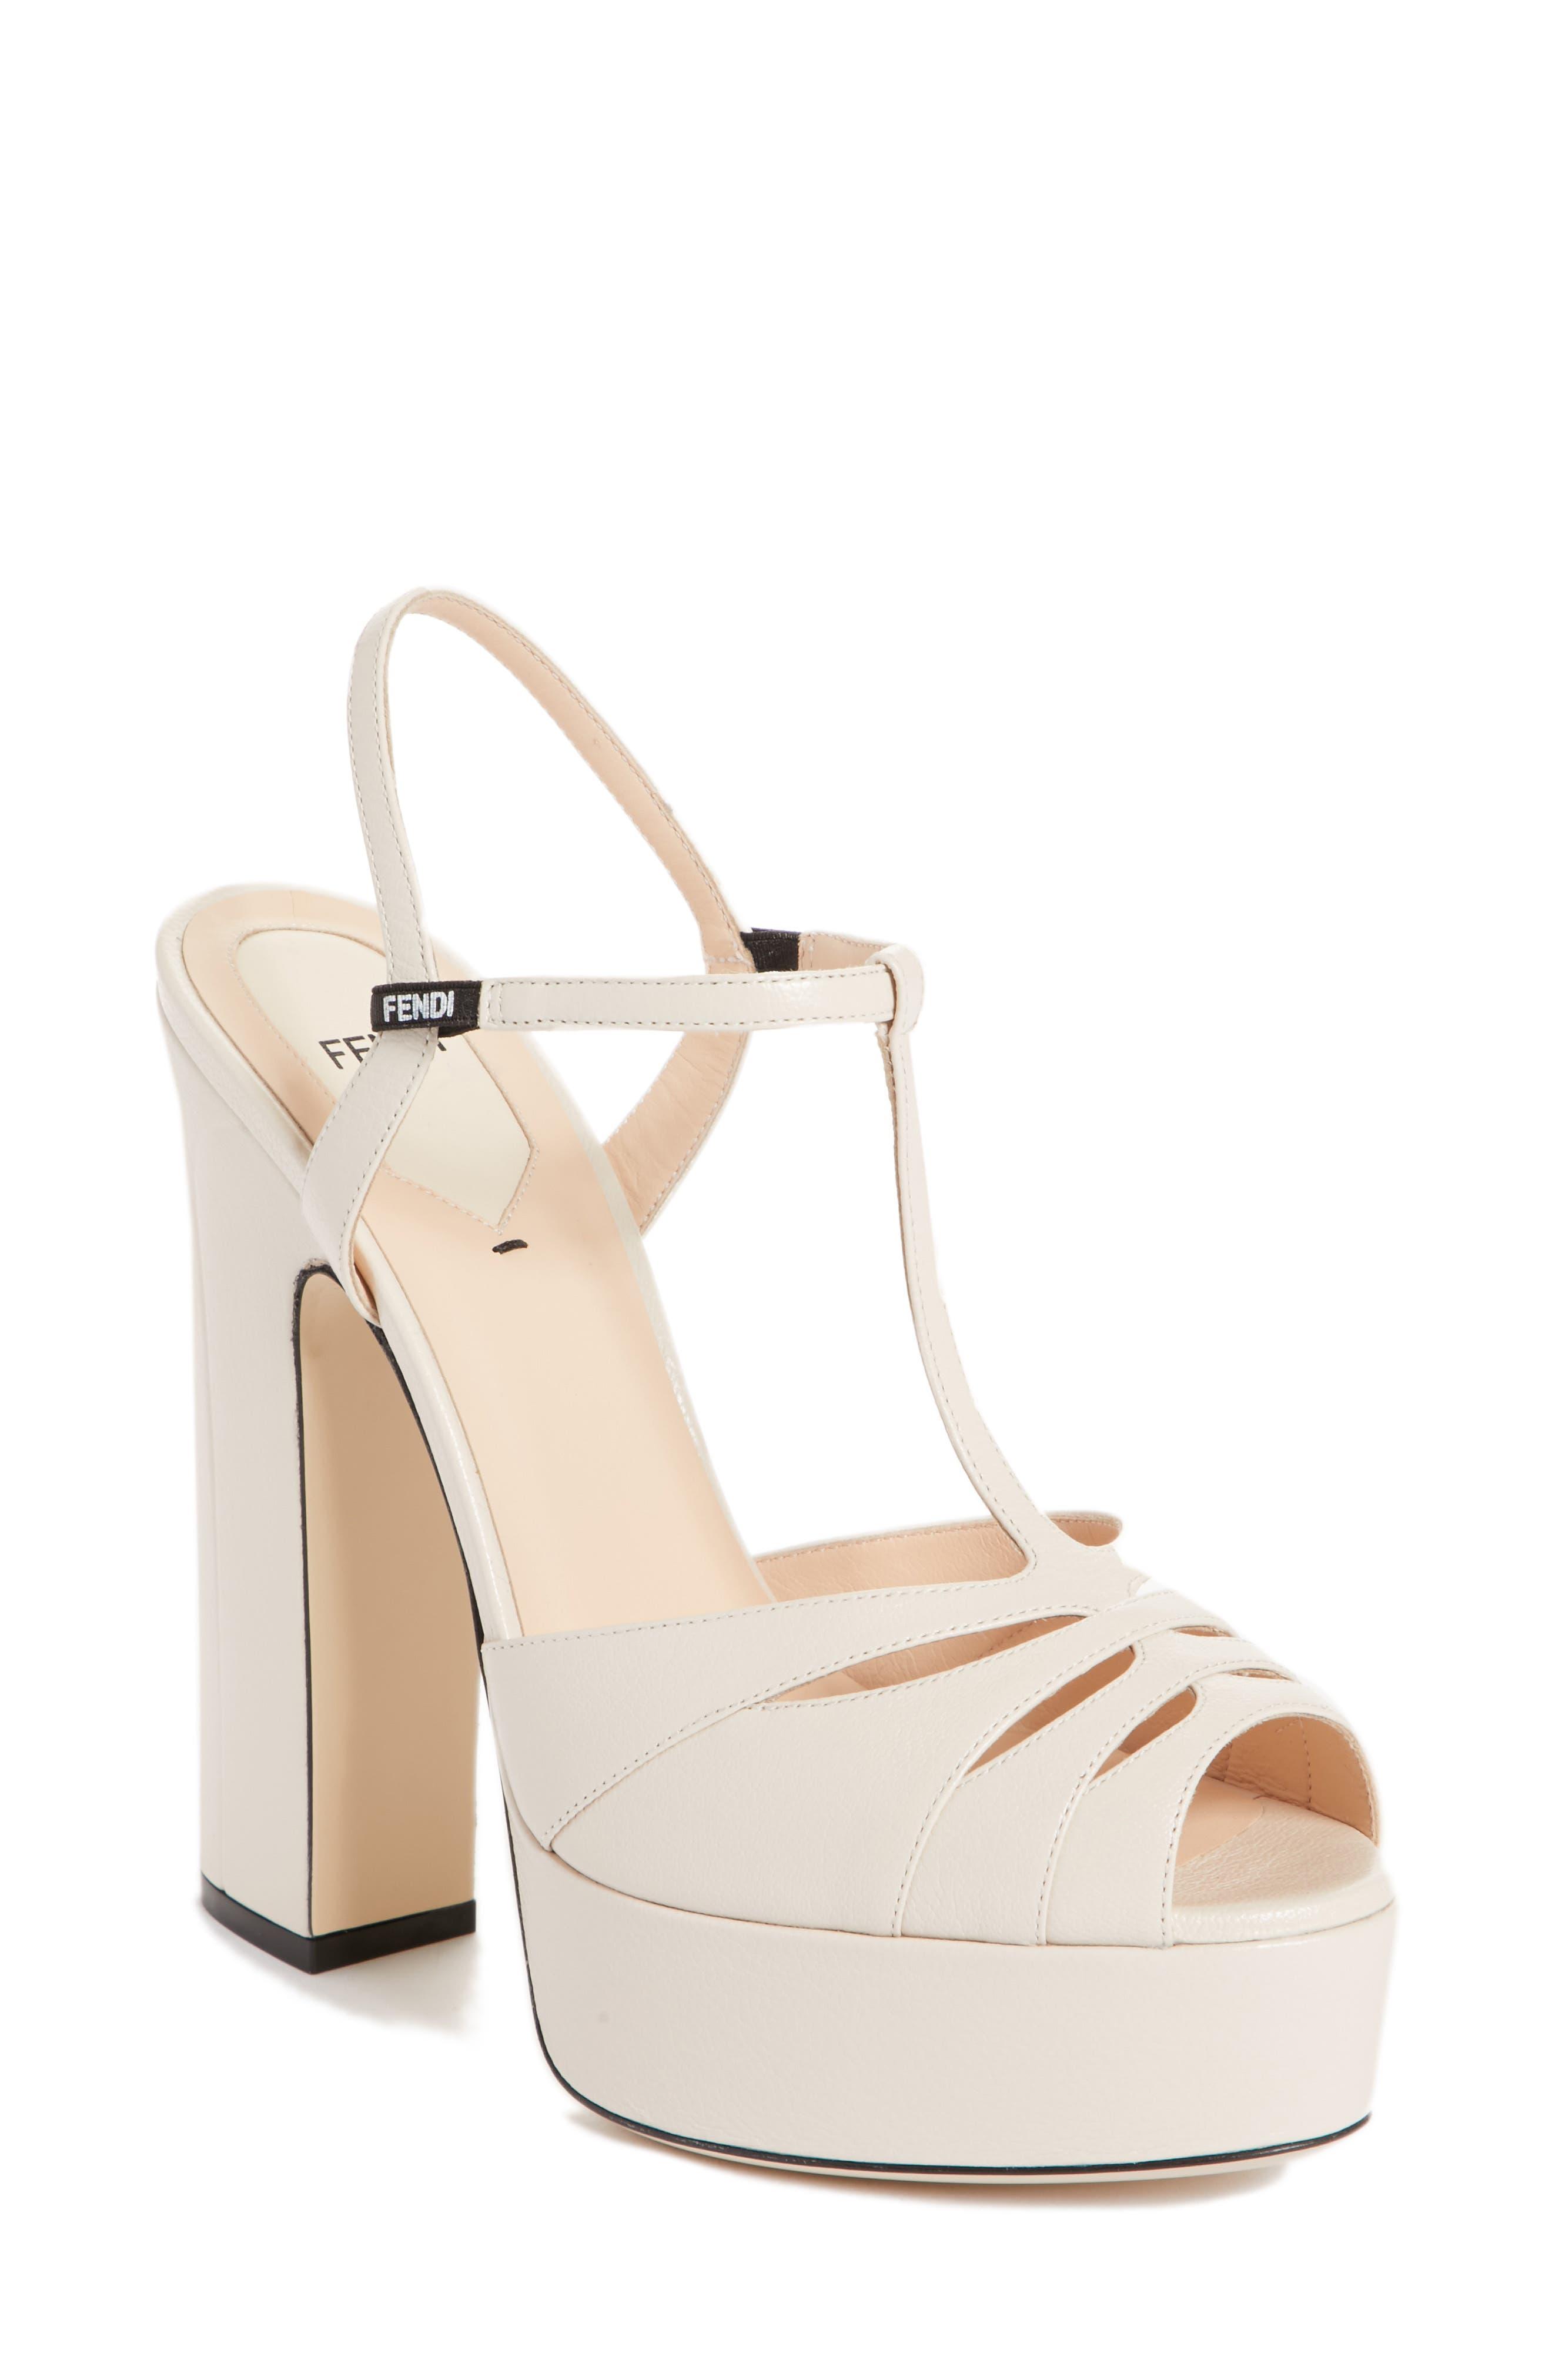 Duo Platform Sandal,                         Main,                         color, Nude